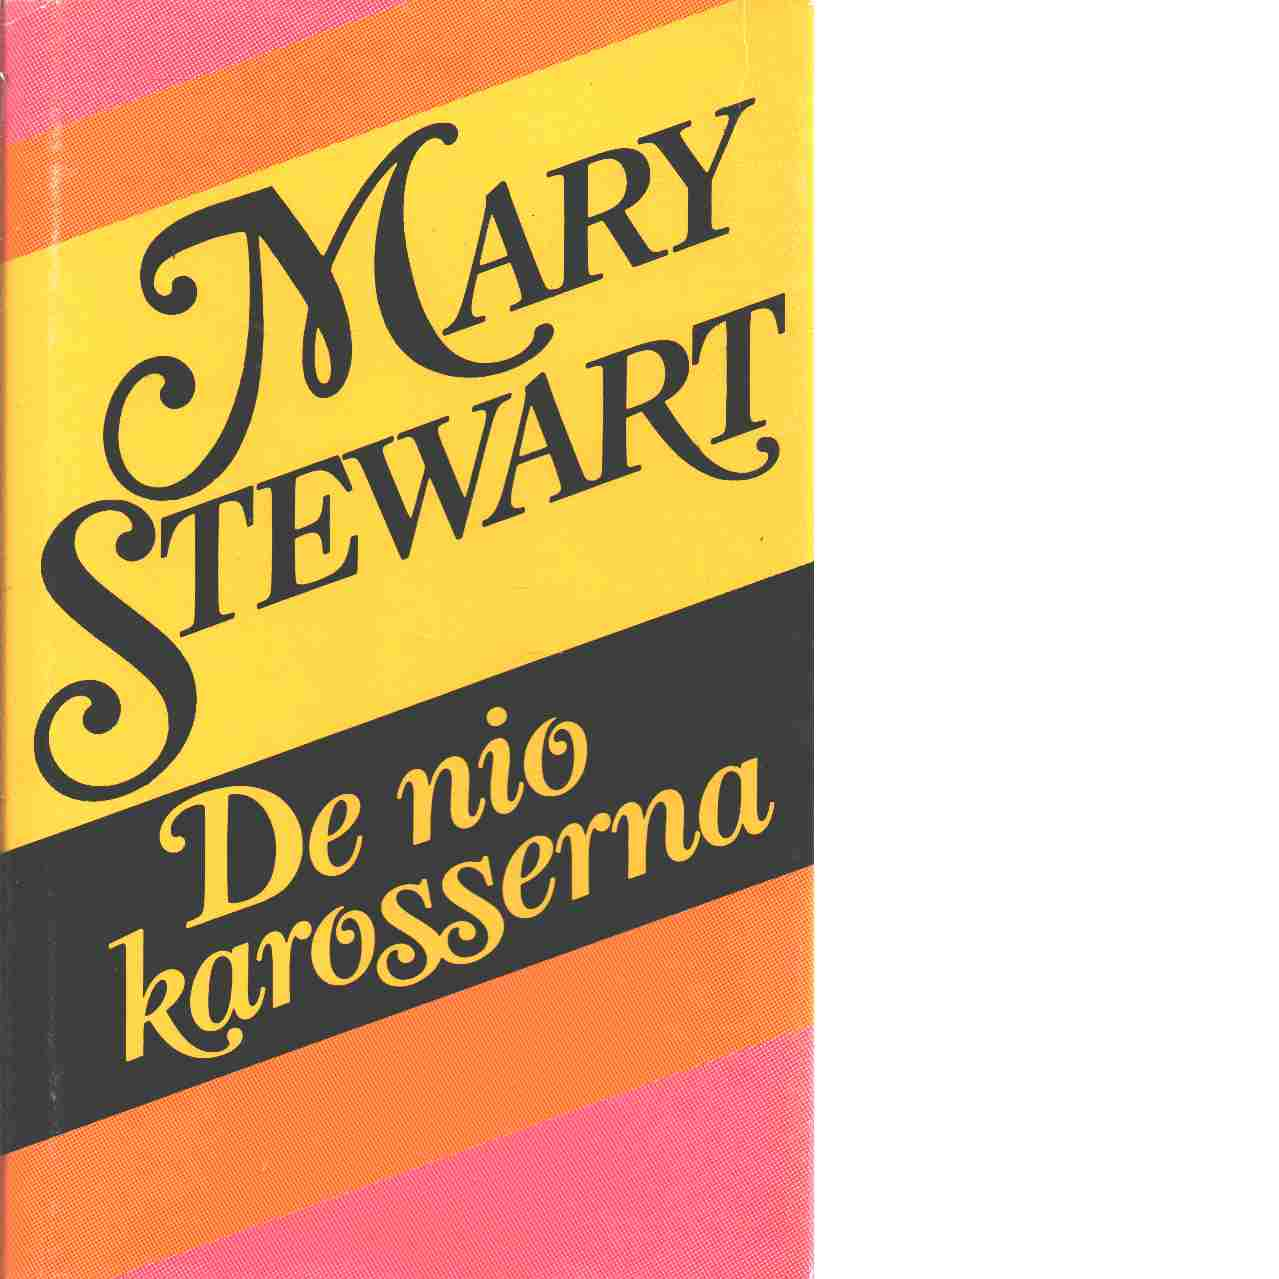 De nio karosserna - Stewart, Mary